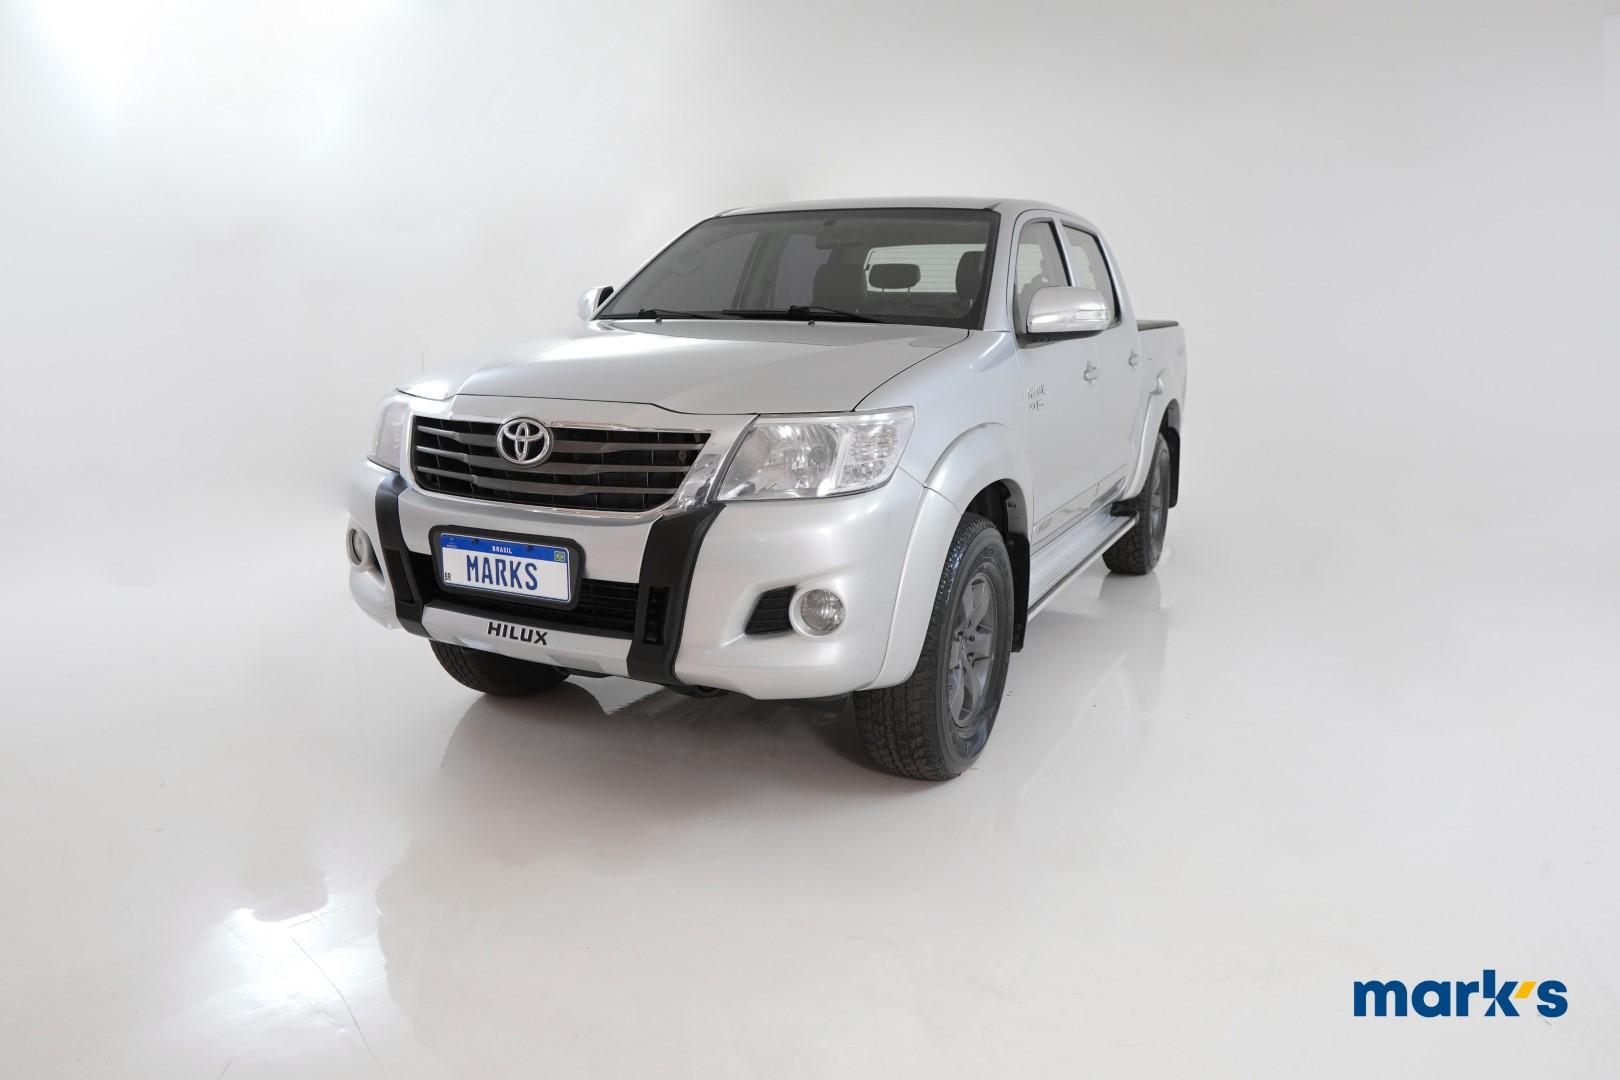 Foto do veículo Toyota Hilux